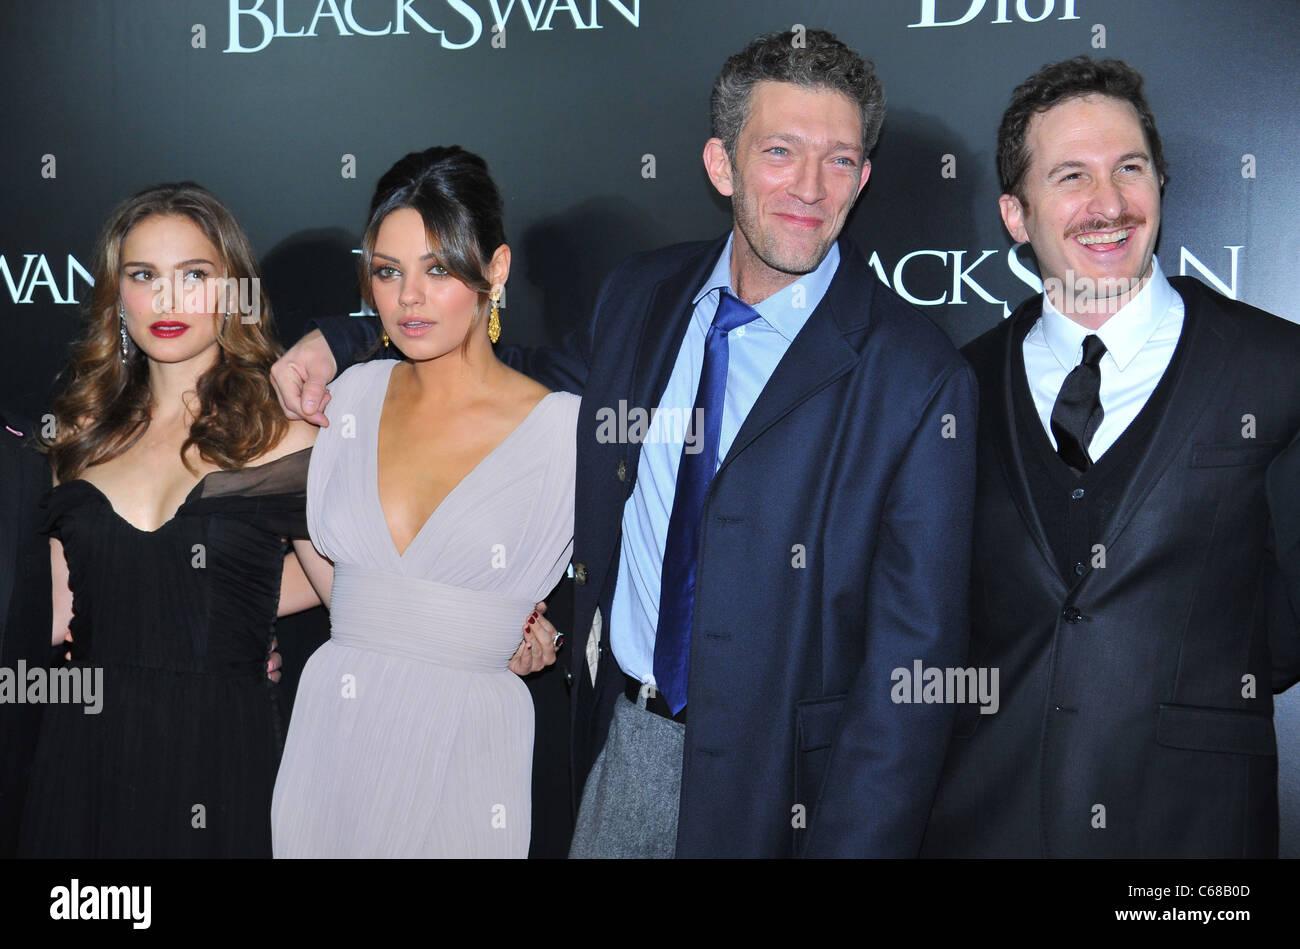 Natalie Portman, Mila Kunis, Vincent Cassell, Darren Aronofsky at arrivals for BLACK SWAN Premiere, The Ziegfeld - Stock Image